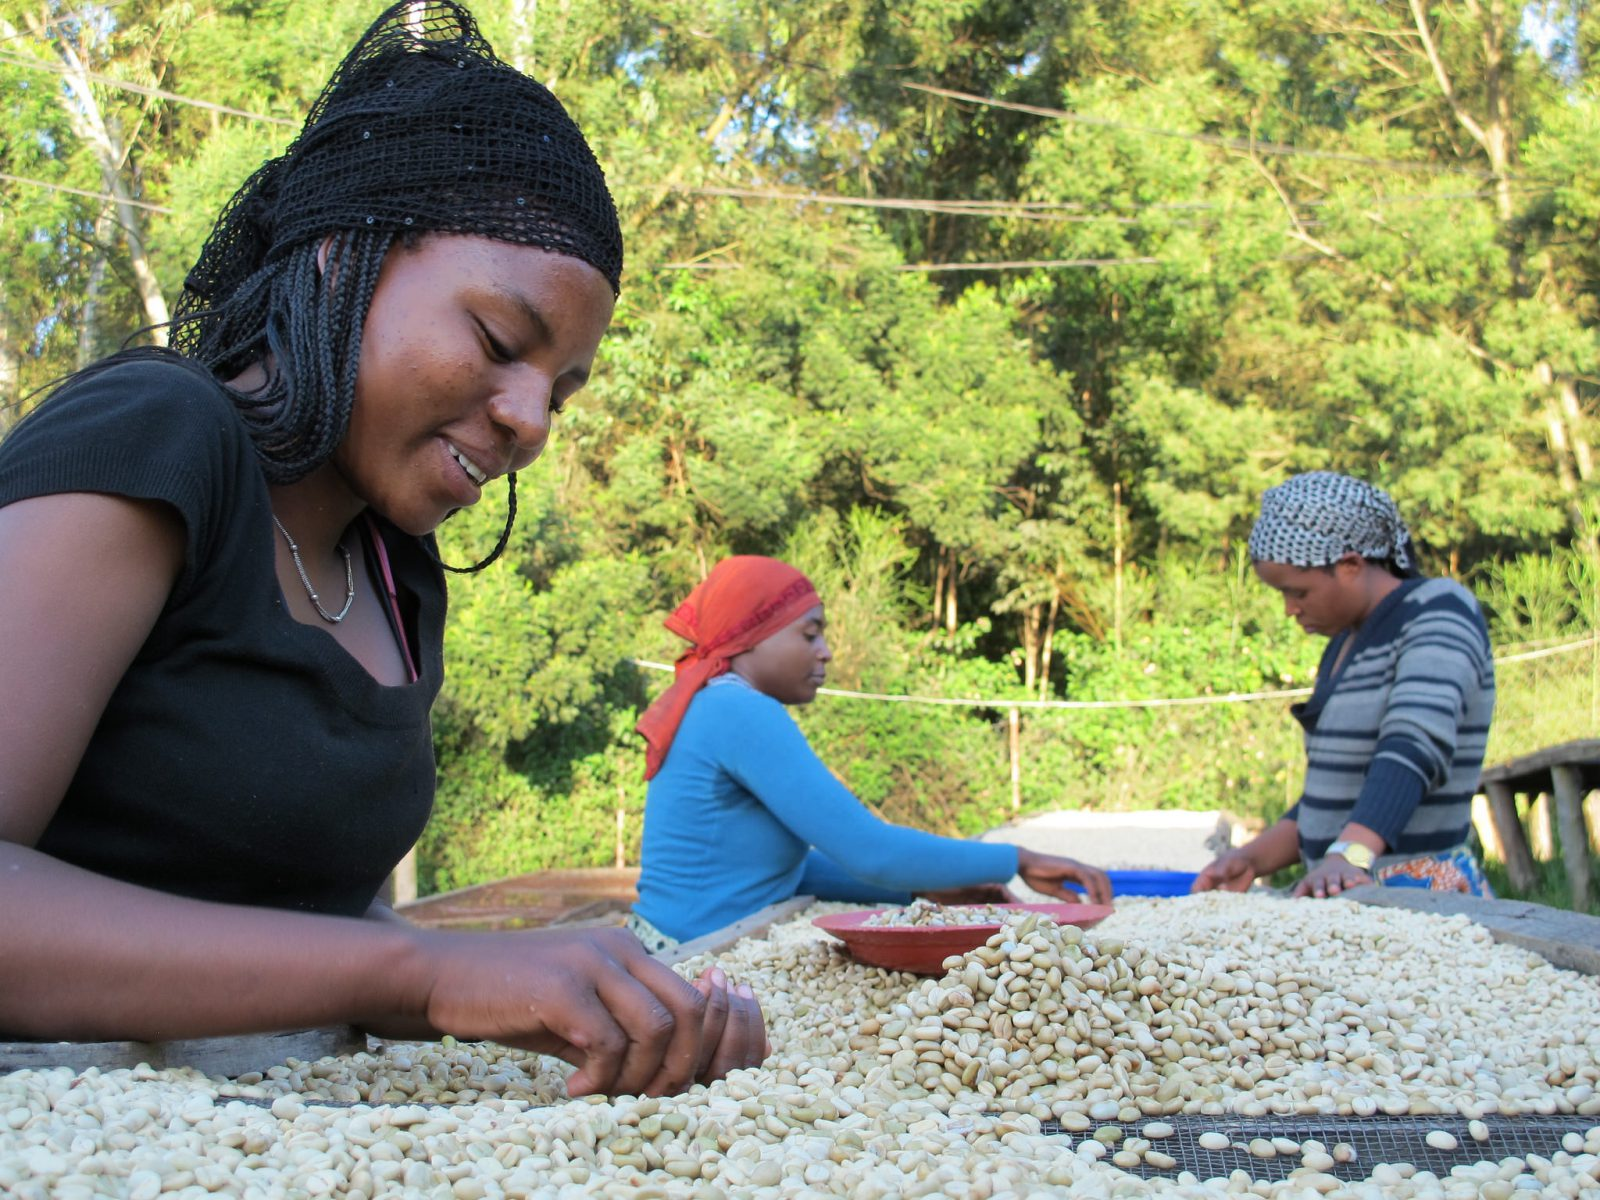 Coffee-sorters-at-Maraba-smallholder-coffee-cooperative-in-Butare-Rwanda.-Credit-Rainforest-Alliance-1.jpg